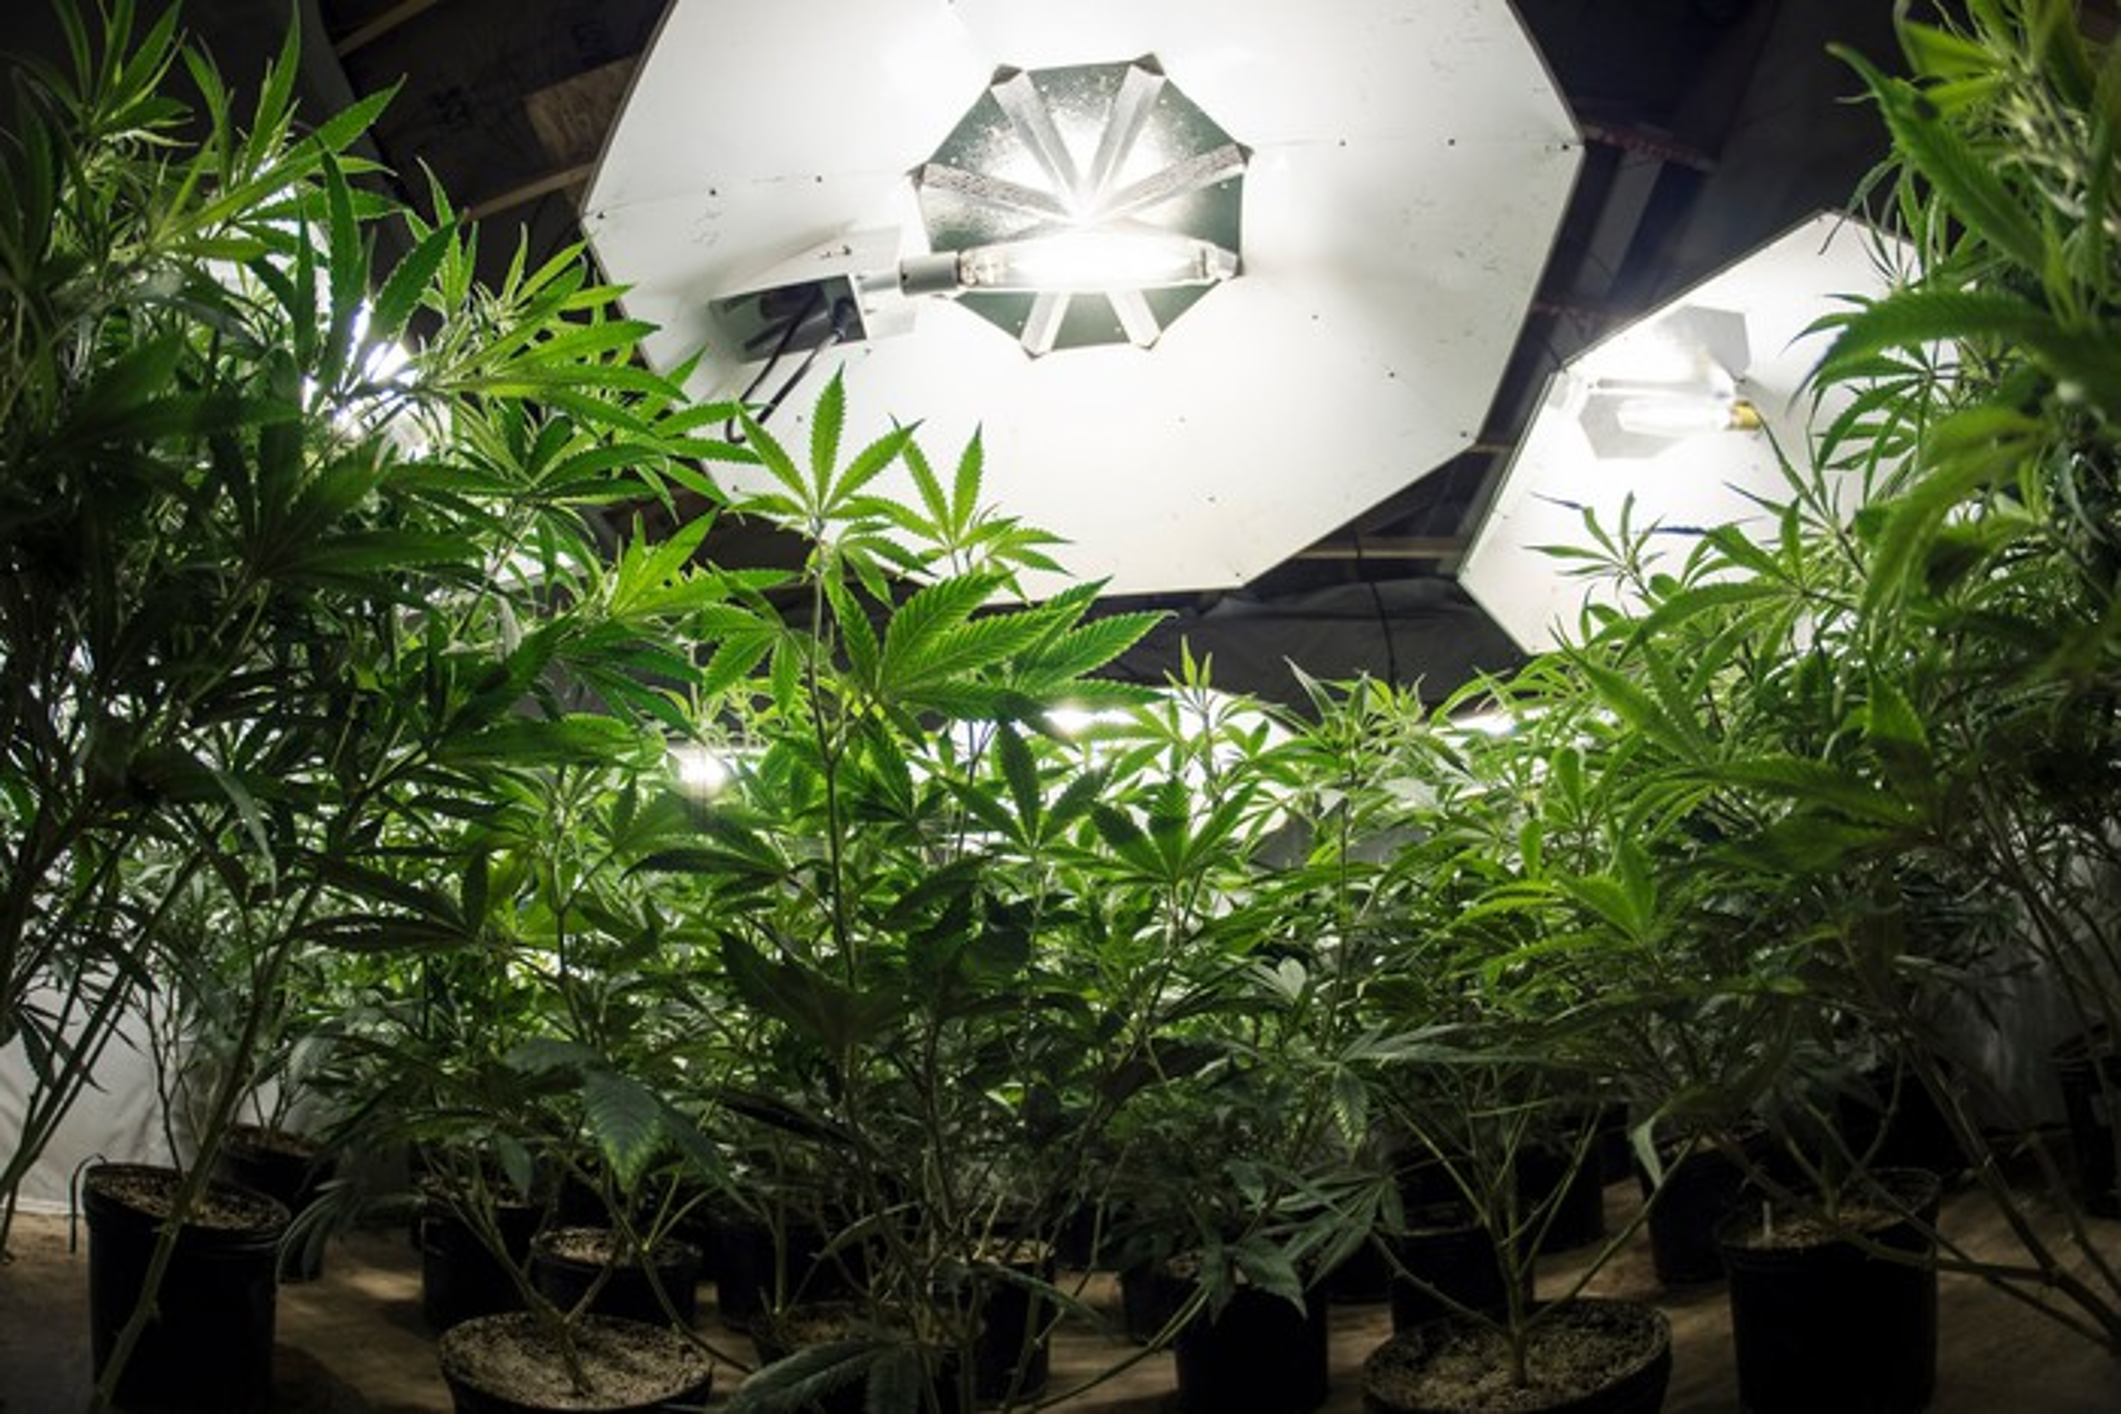 An indoor cannabis grow farm under special lighting.